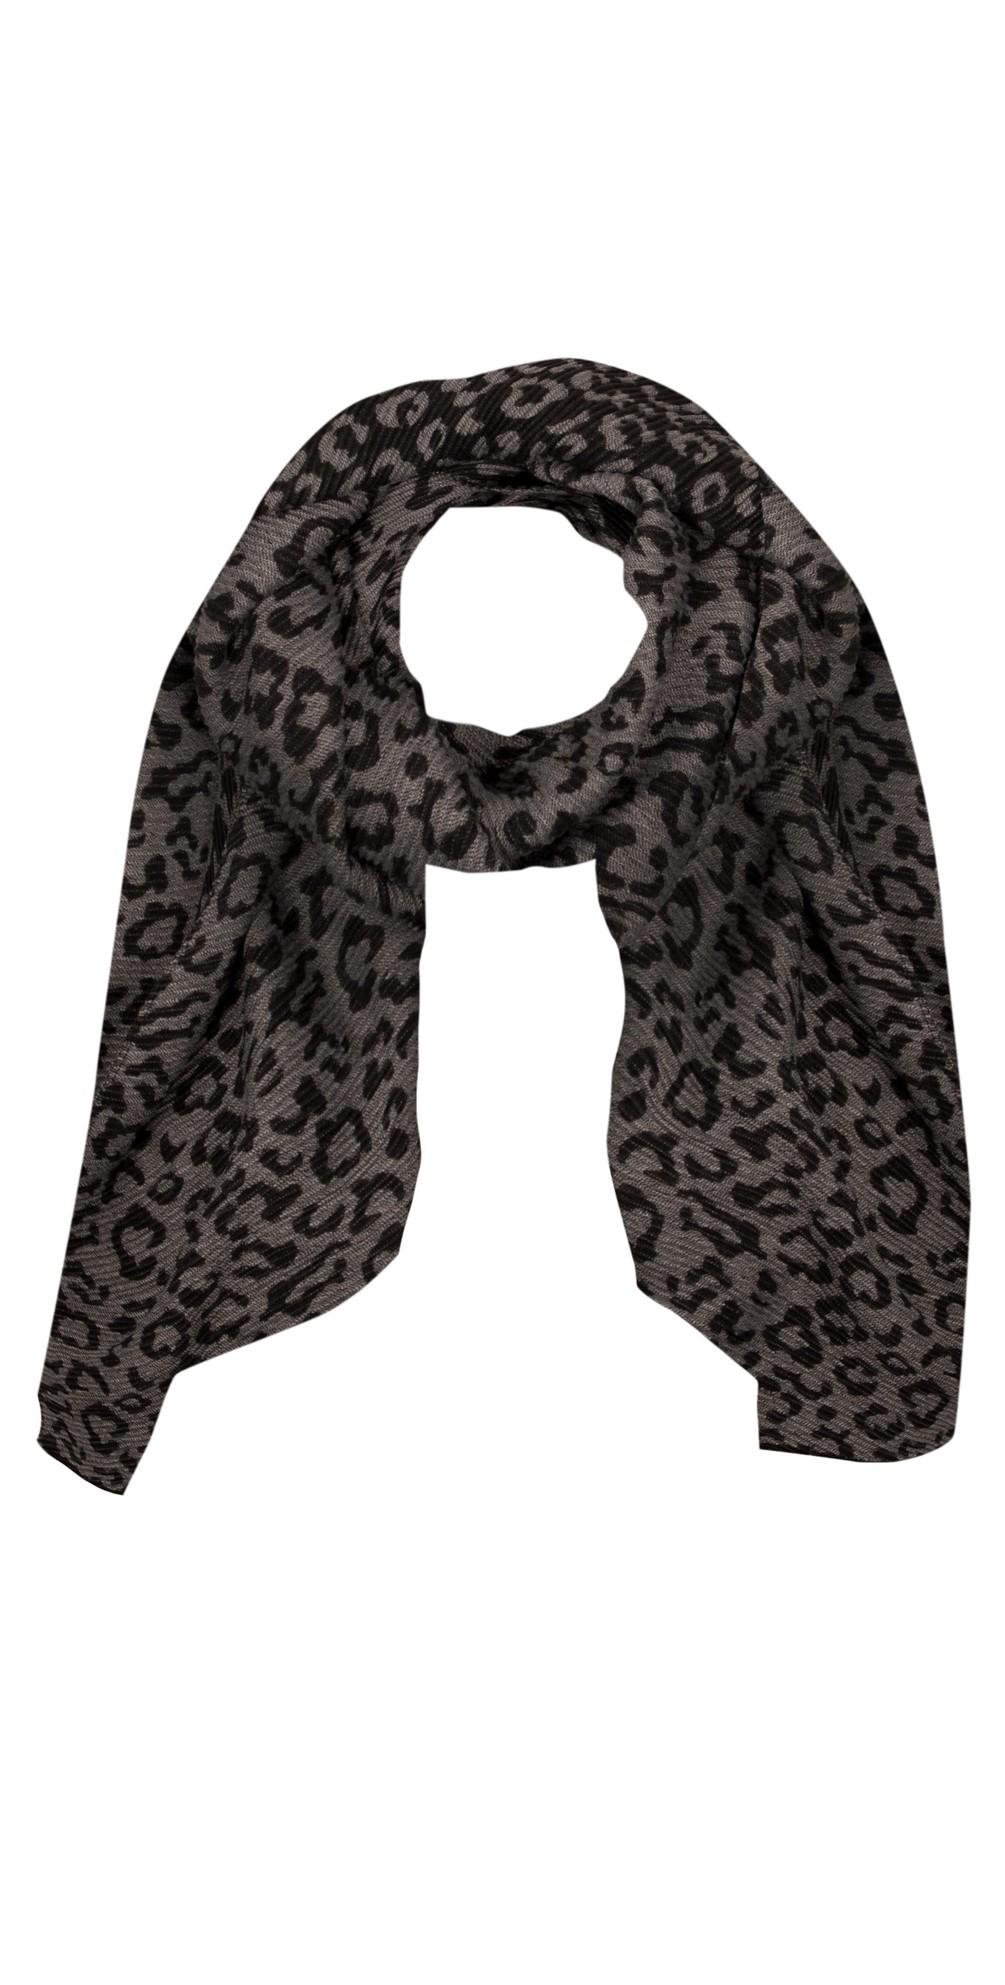 Revo Leopard Scarf main image